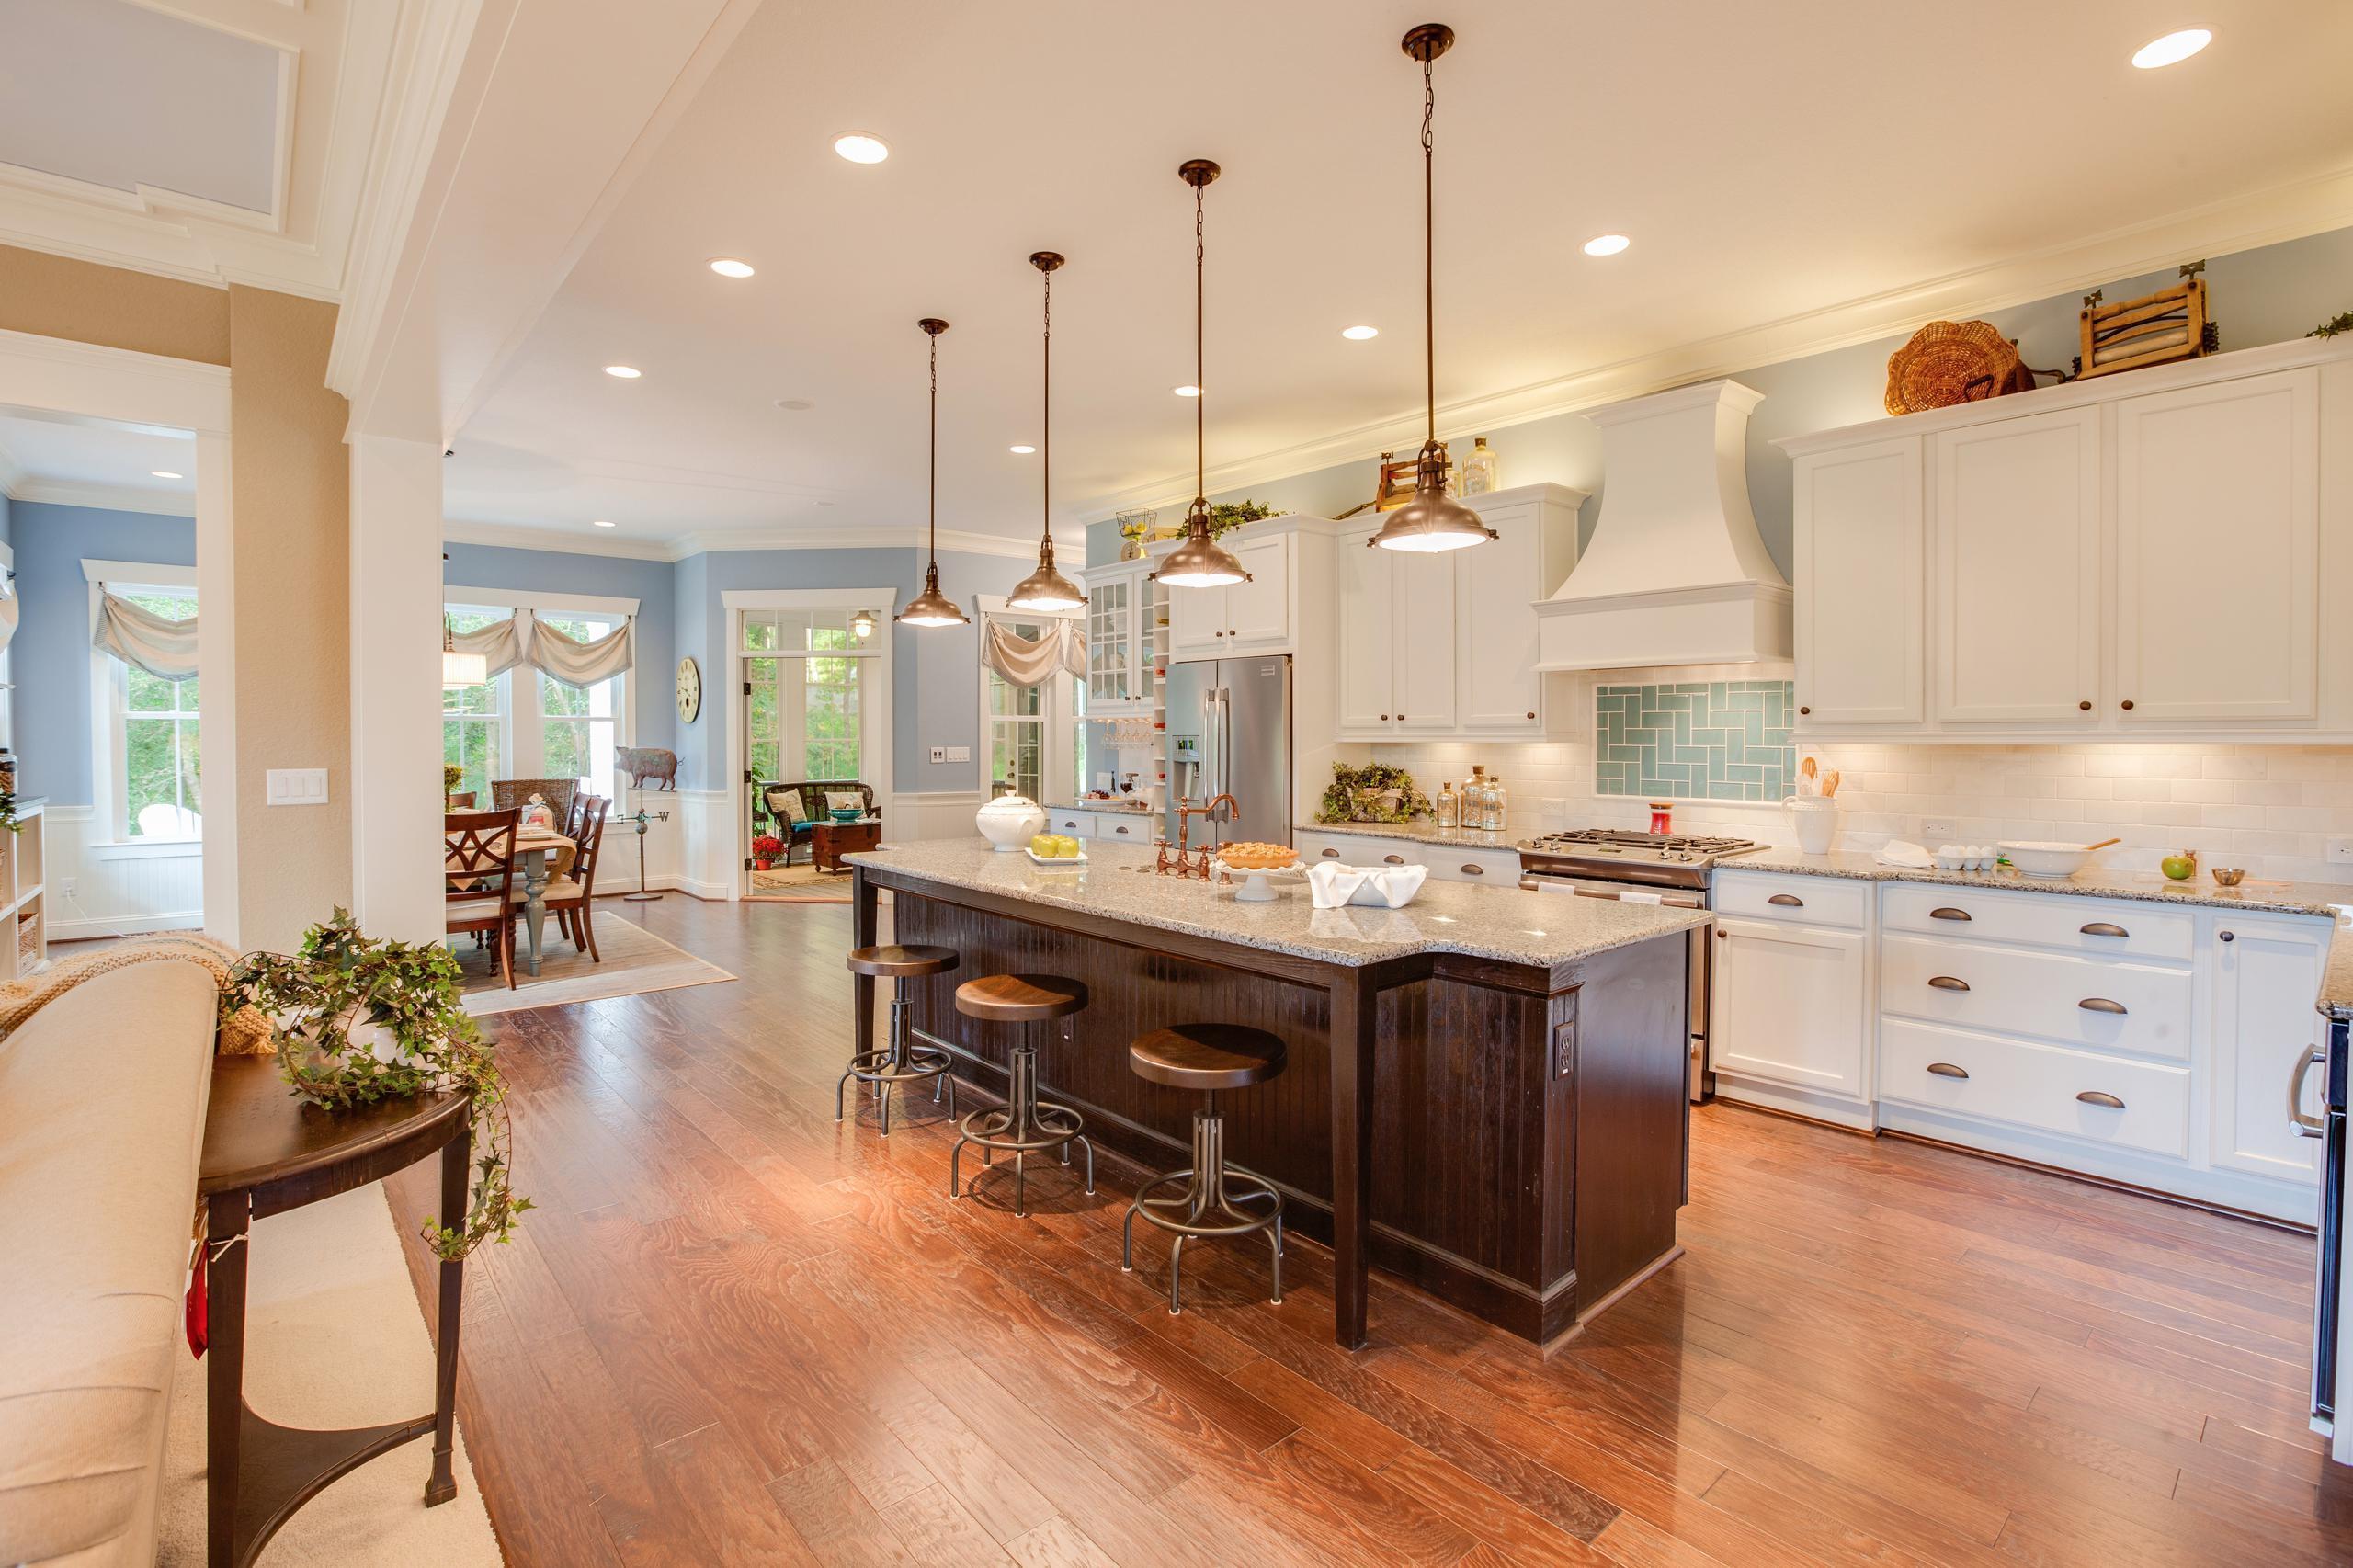 Kitchen featured in The Bridgewater II By Stephen Alexander Homes in Norfolk-Newport News, VA